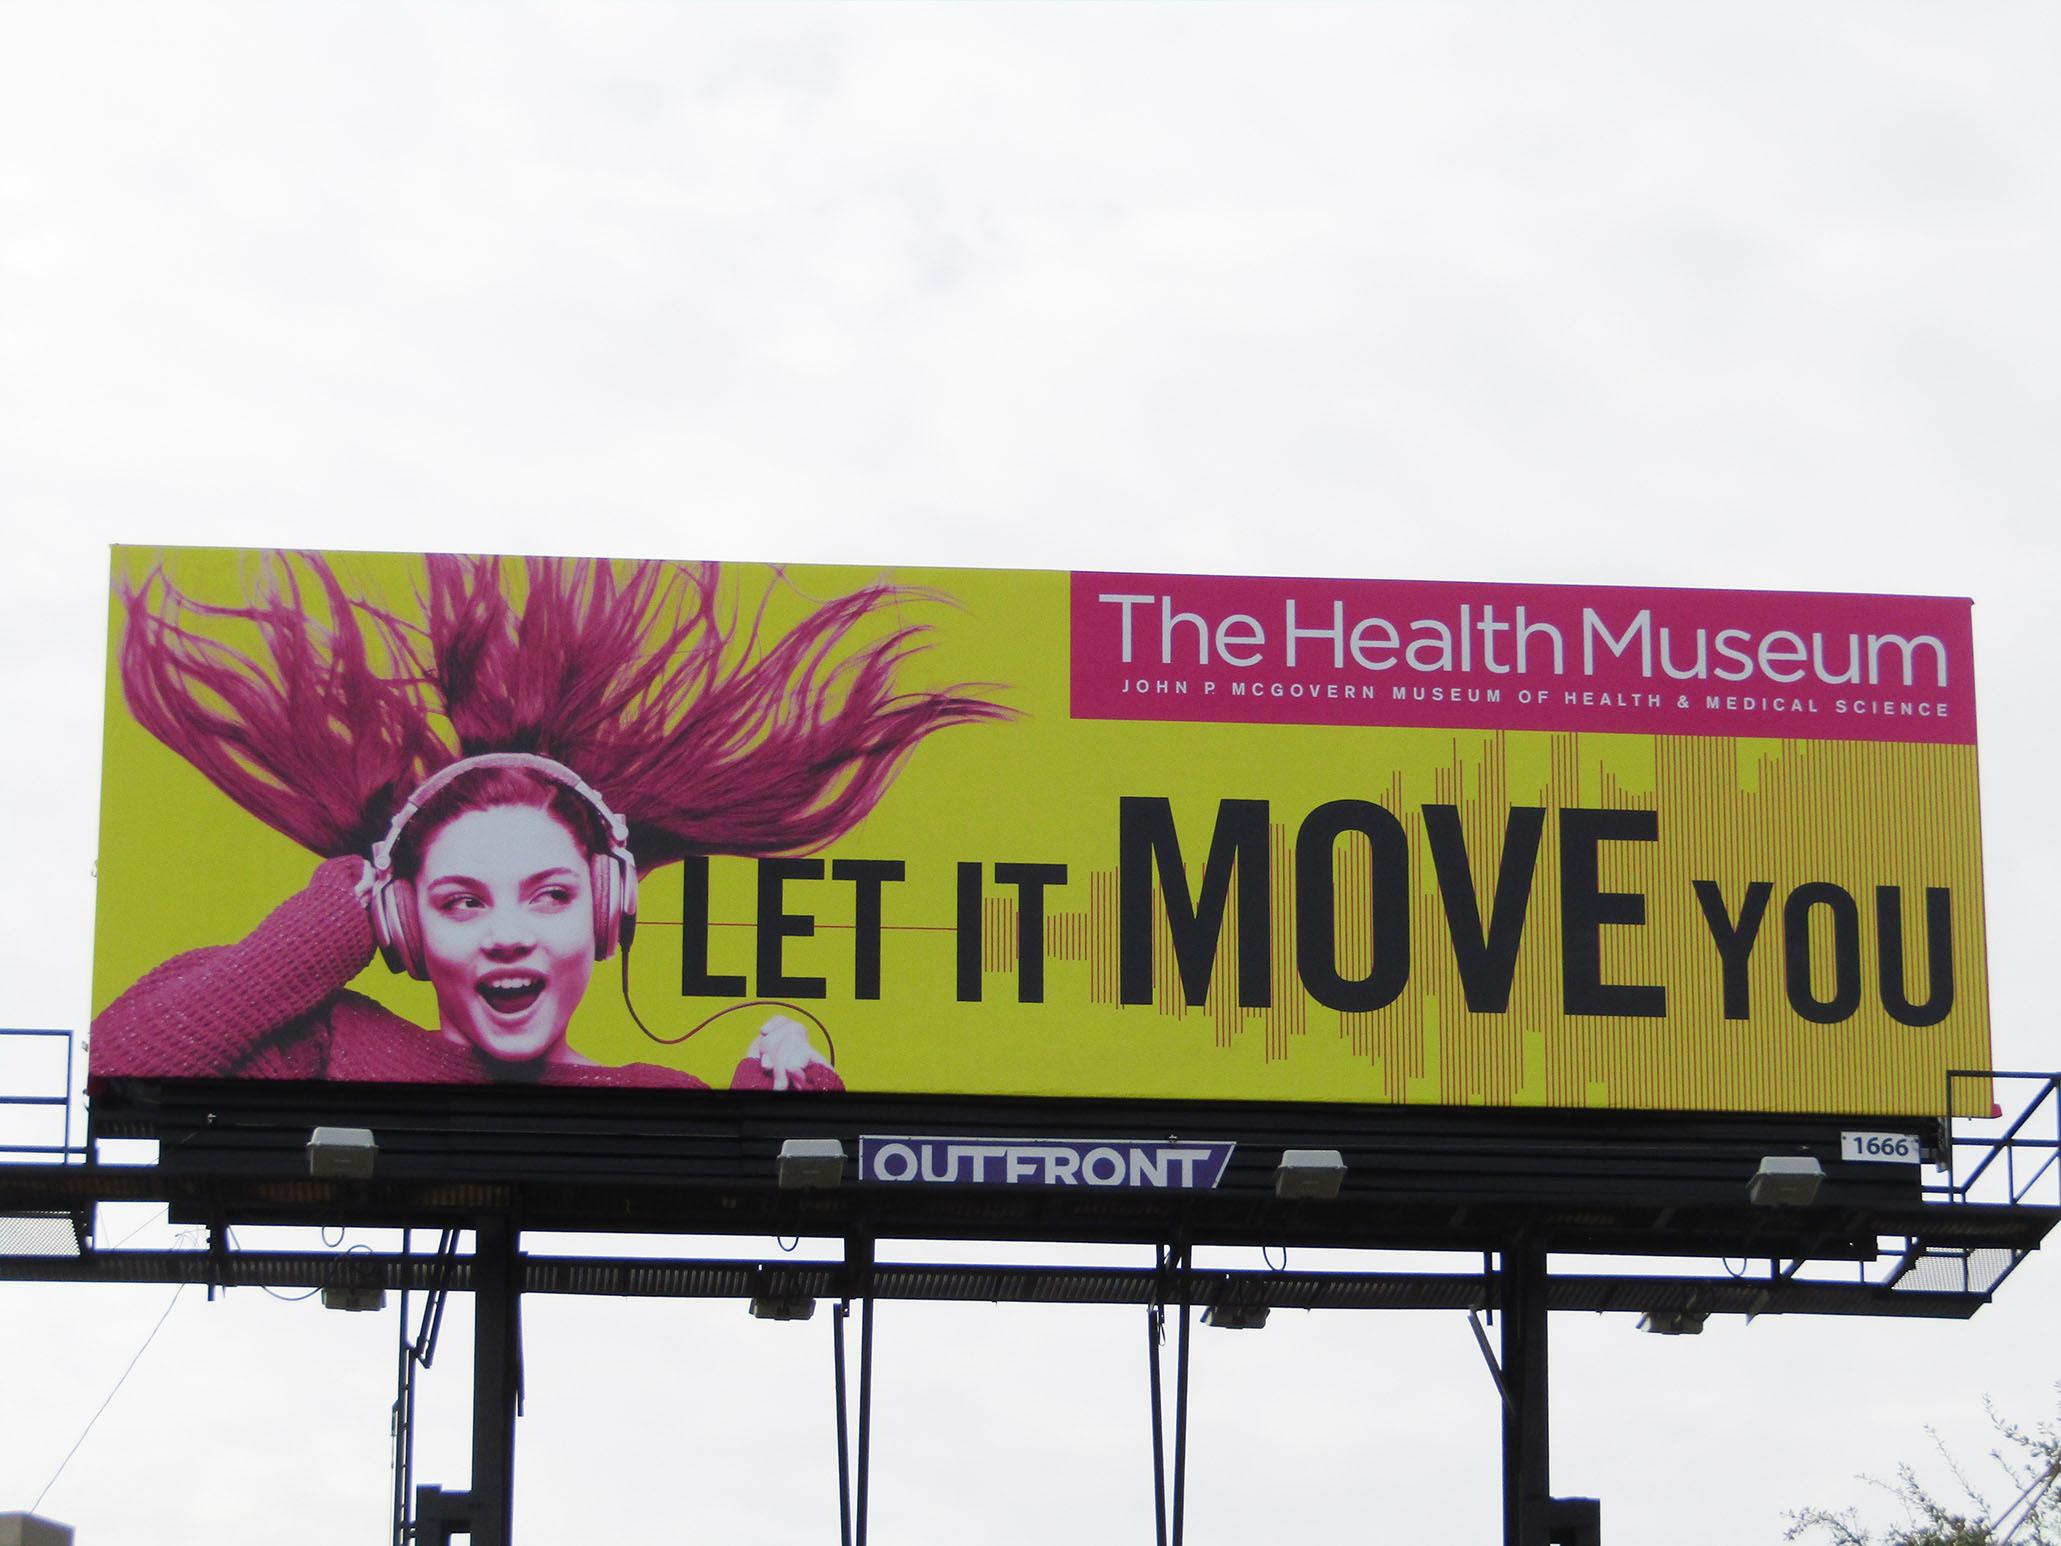 The Health Museum Billboard